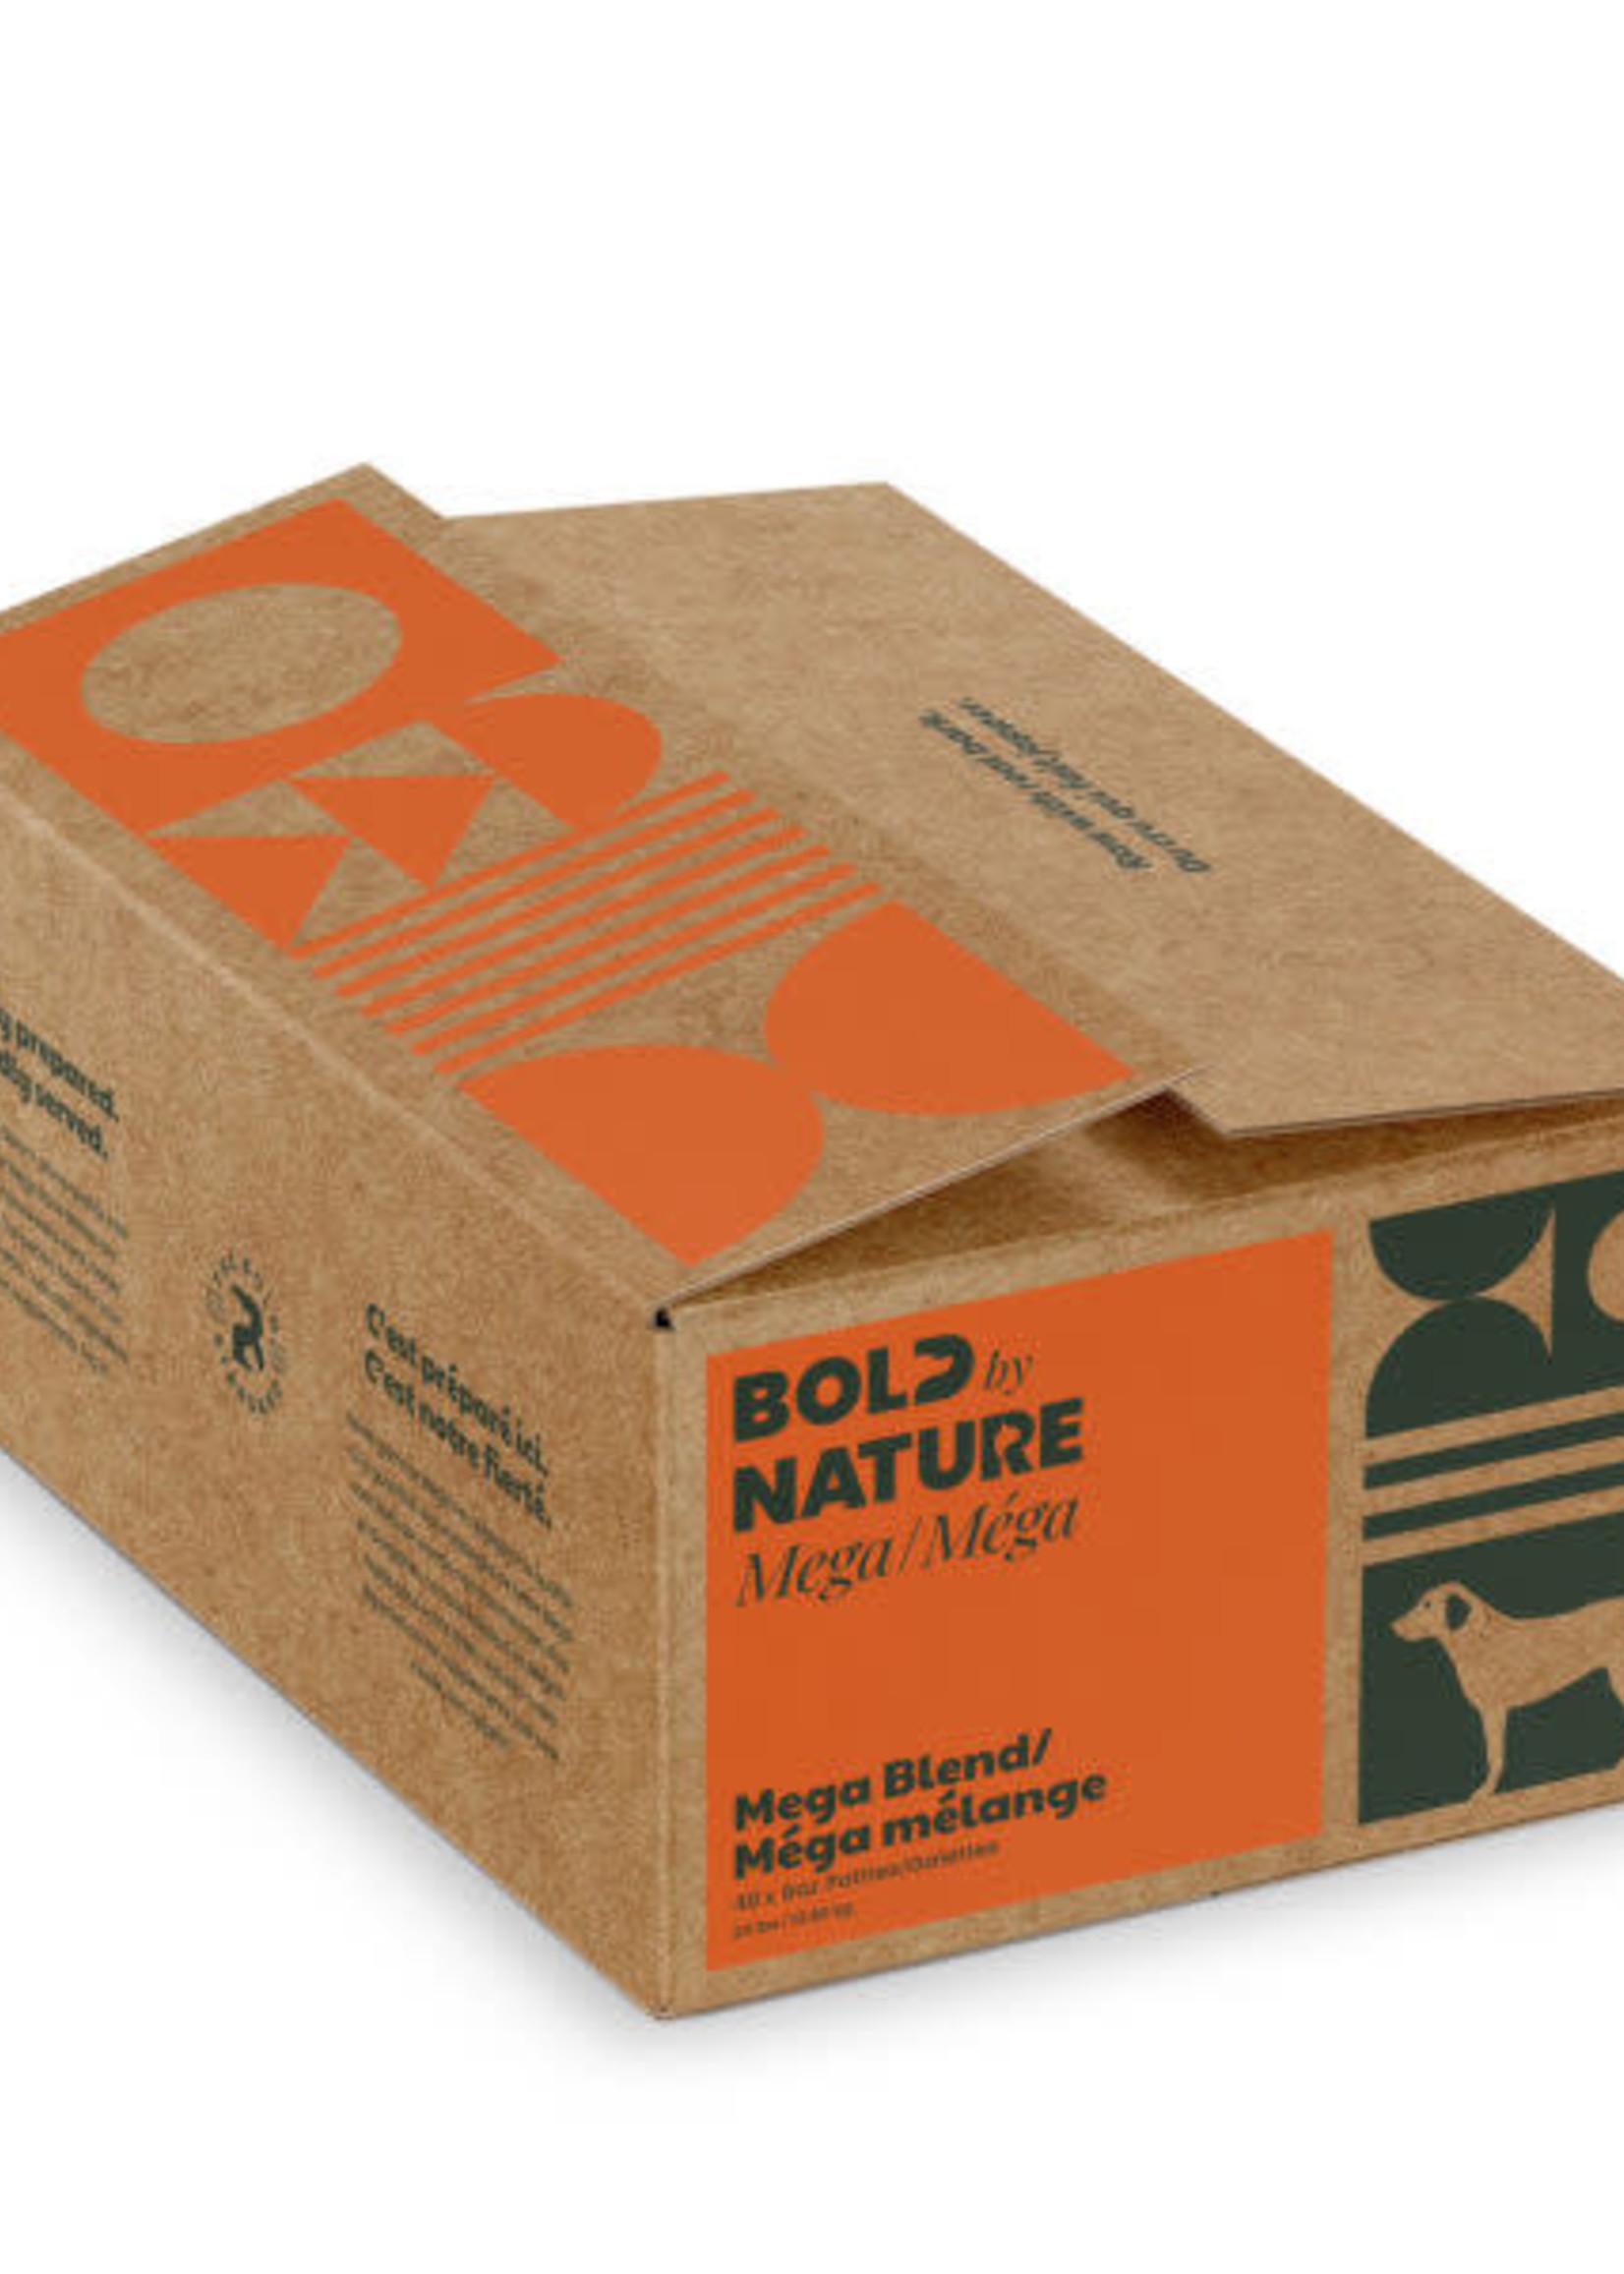 Mega Dog Raw Bold by Nature The Pack: Mega Blend 24lbs